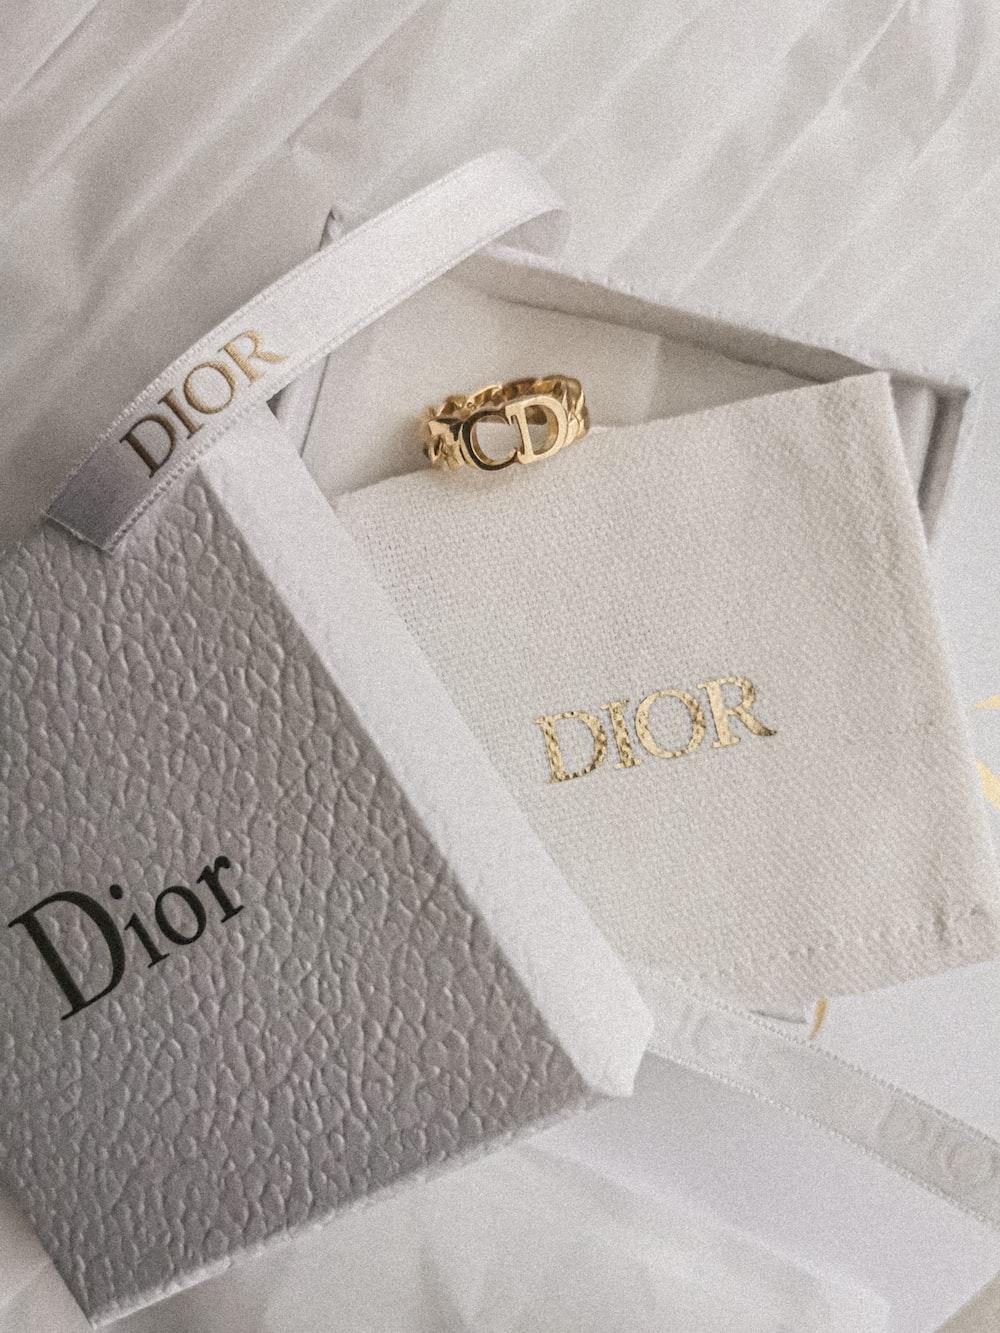 gold and diamond ring on white textile